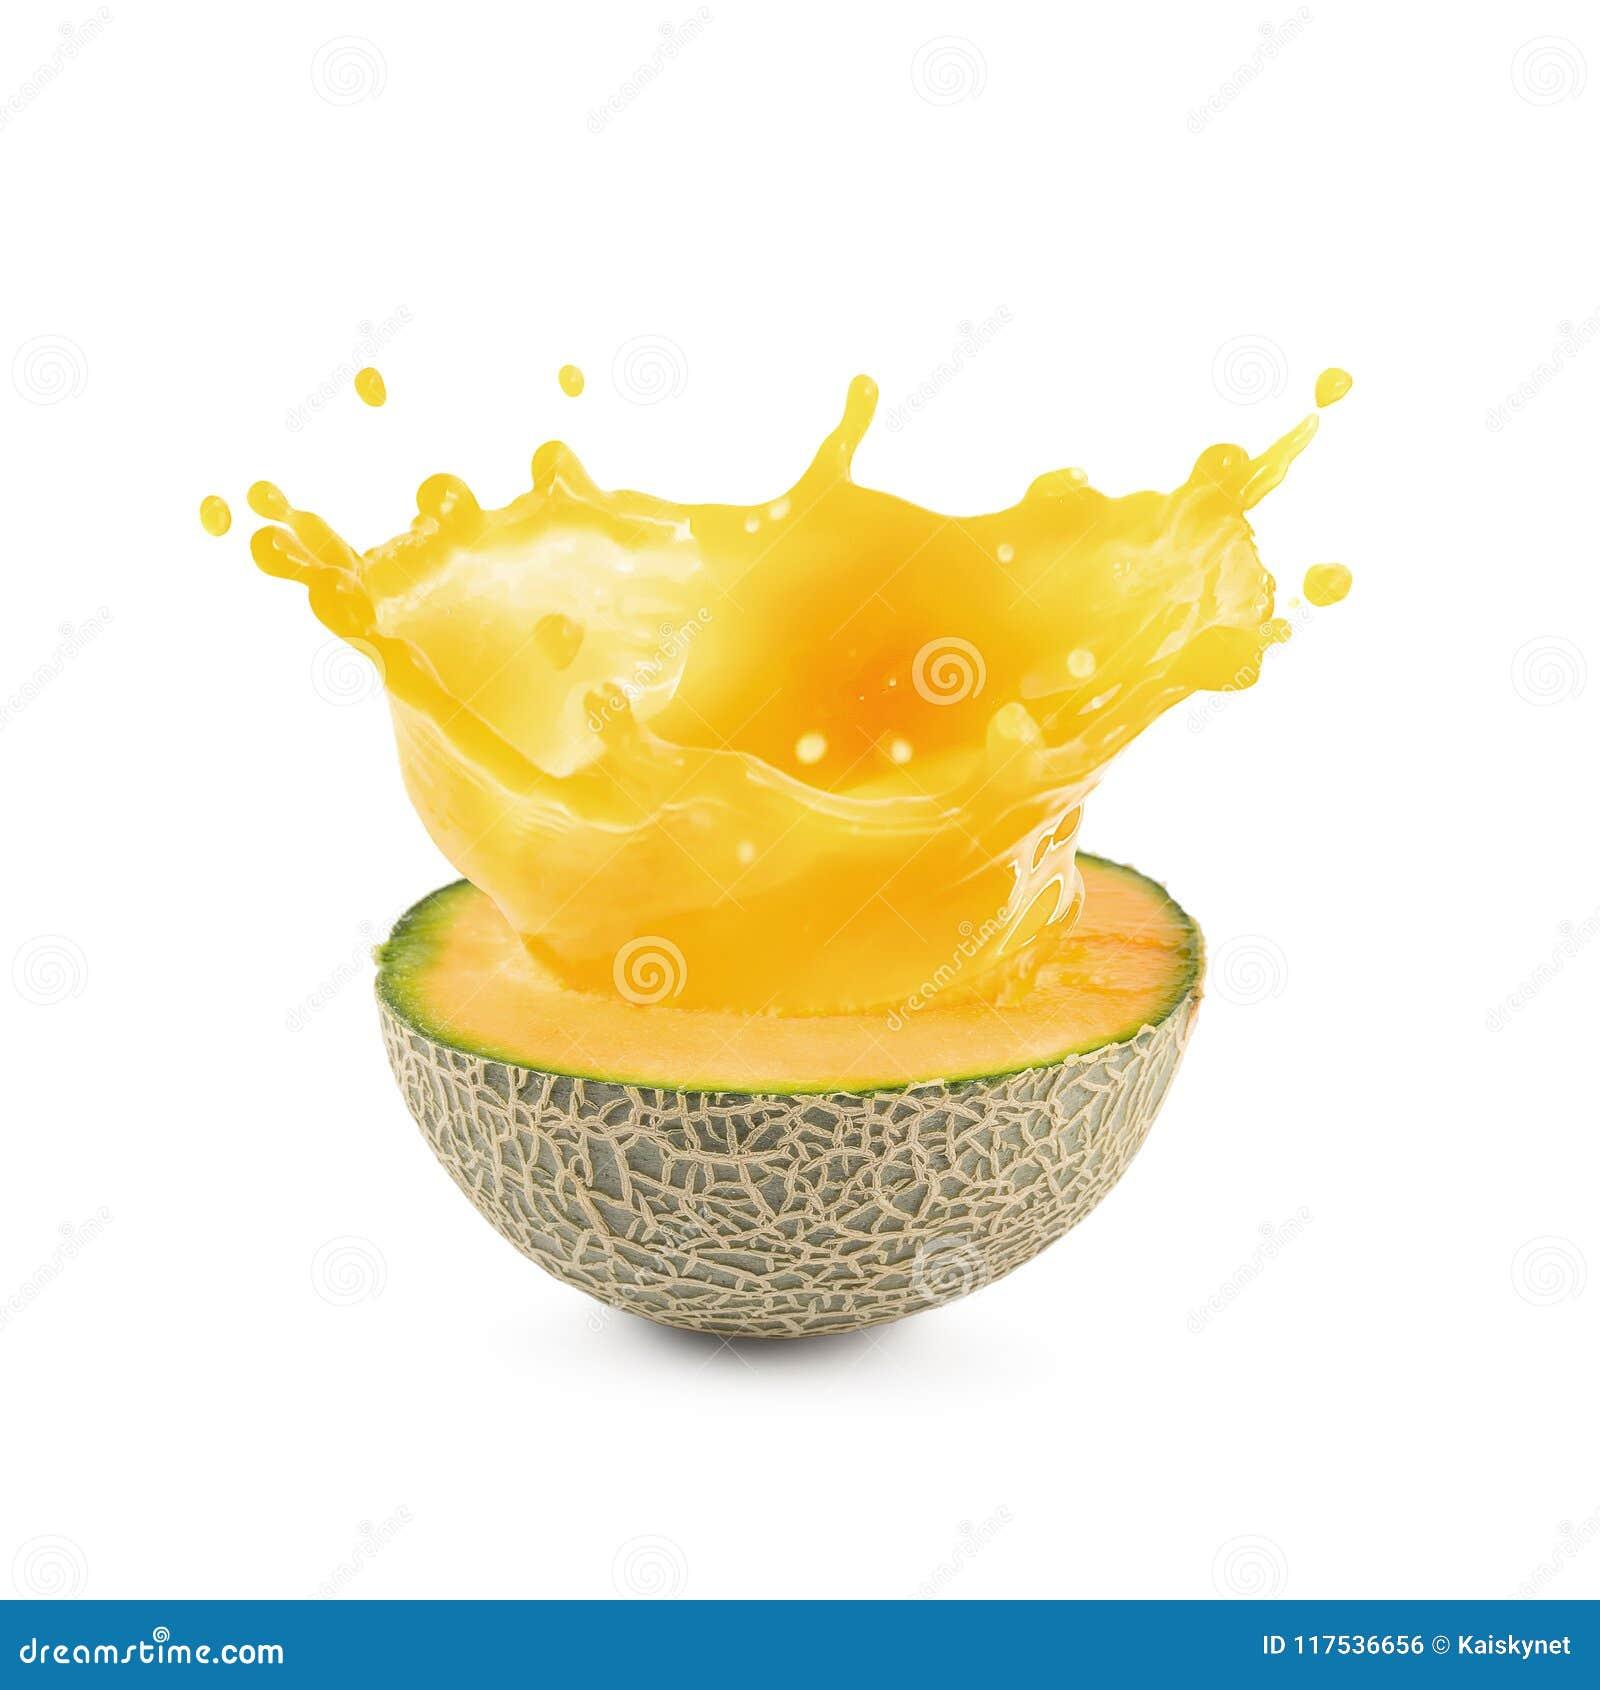 Melonfruktsaft eller cantaloupmelonfruktsaft som isoleras på en vit bakgrund